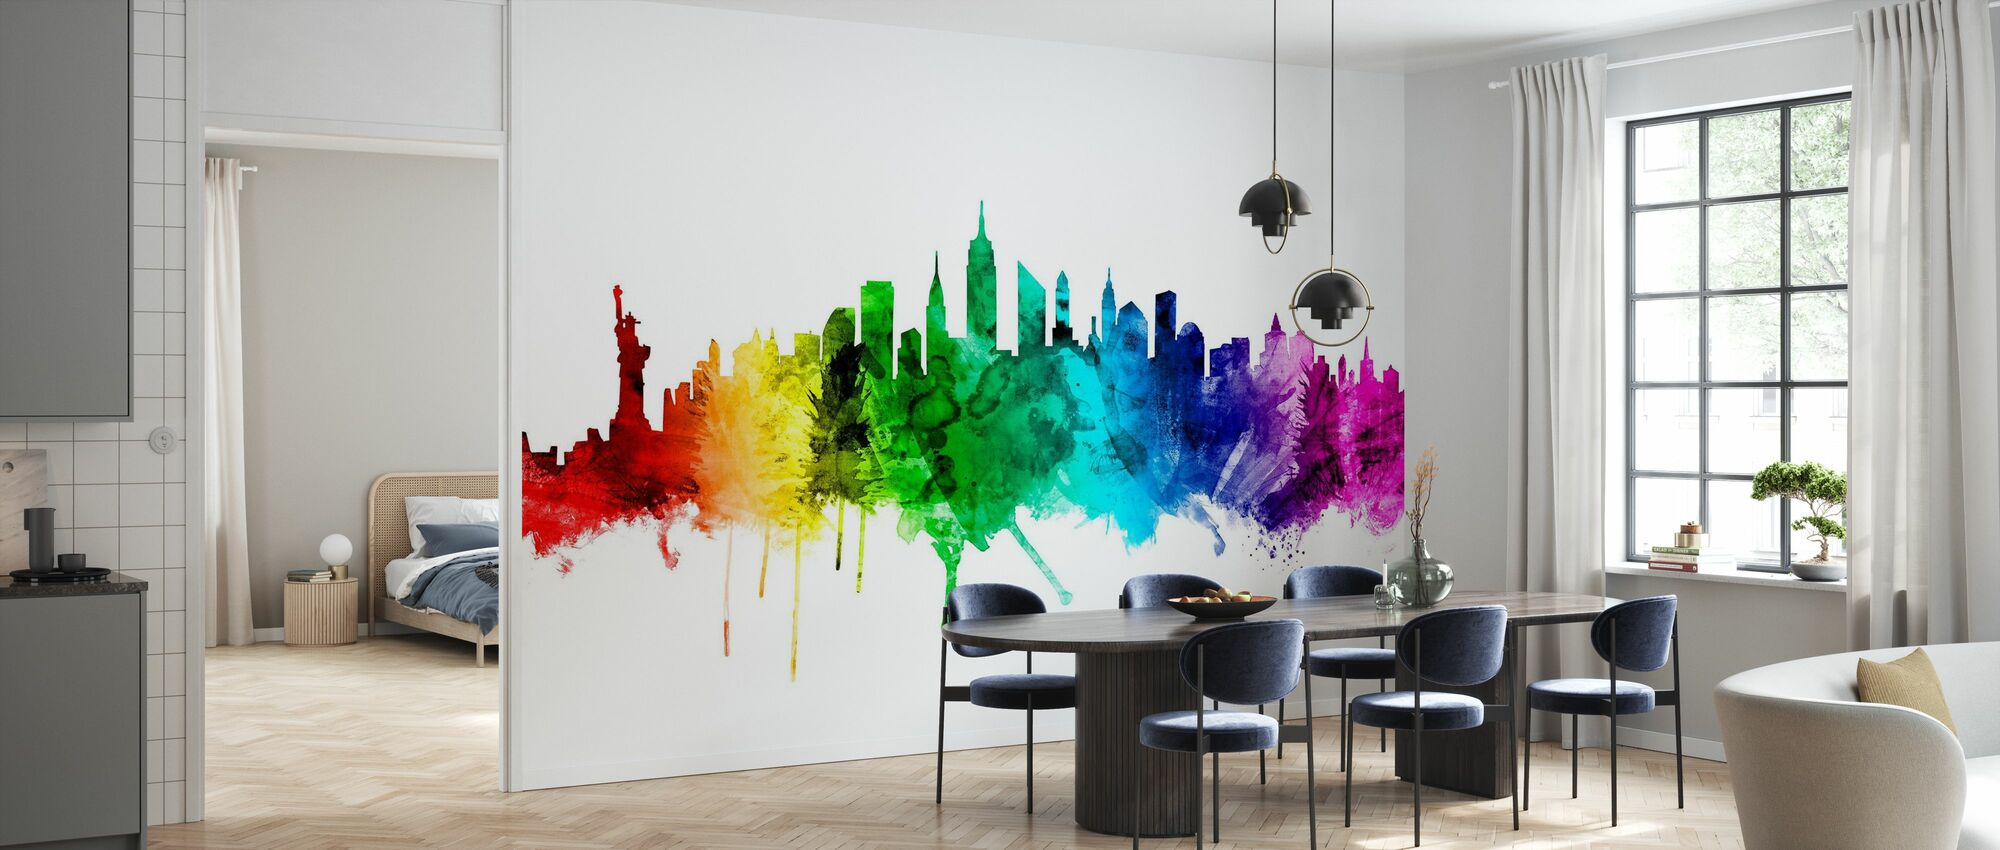 New York Skyline Rainbow 2 - Wallpaper - Kitchen